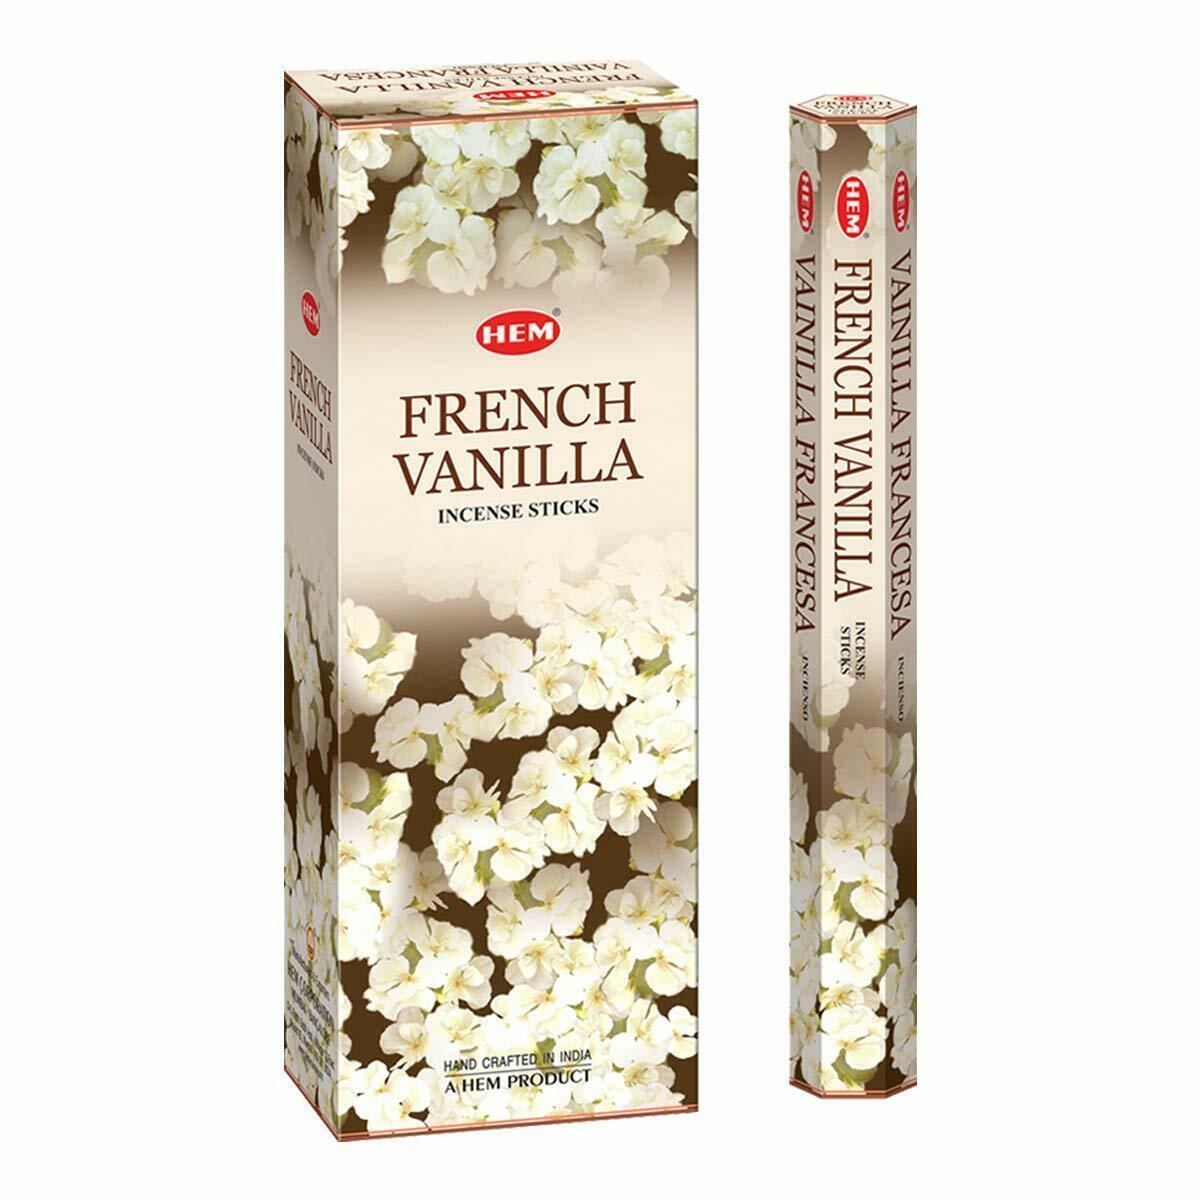 Hem French Vanilla Sticks Beautiful Handmade Natural Fragrances 6x20 Sticks - $16.23